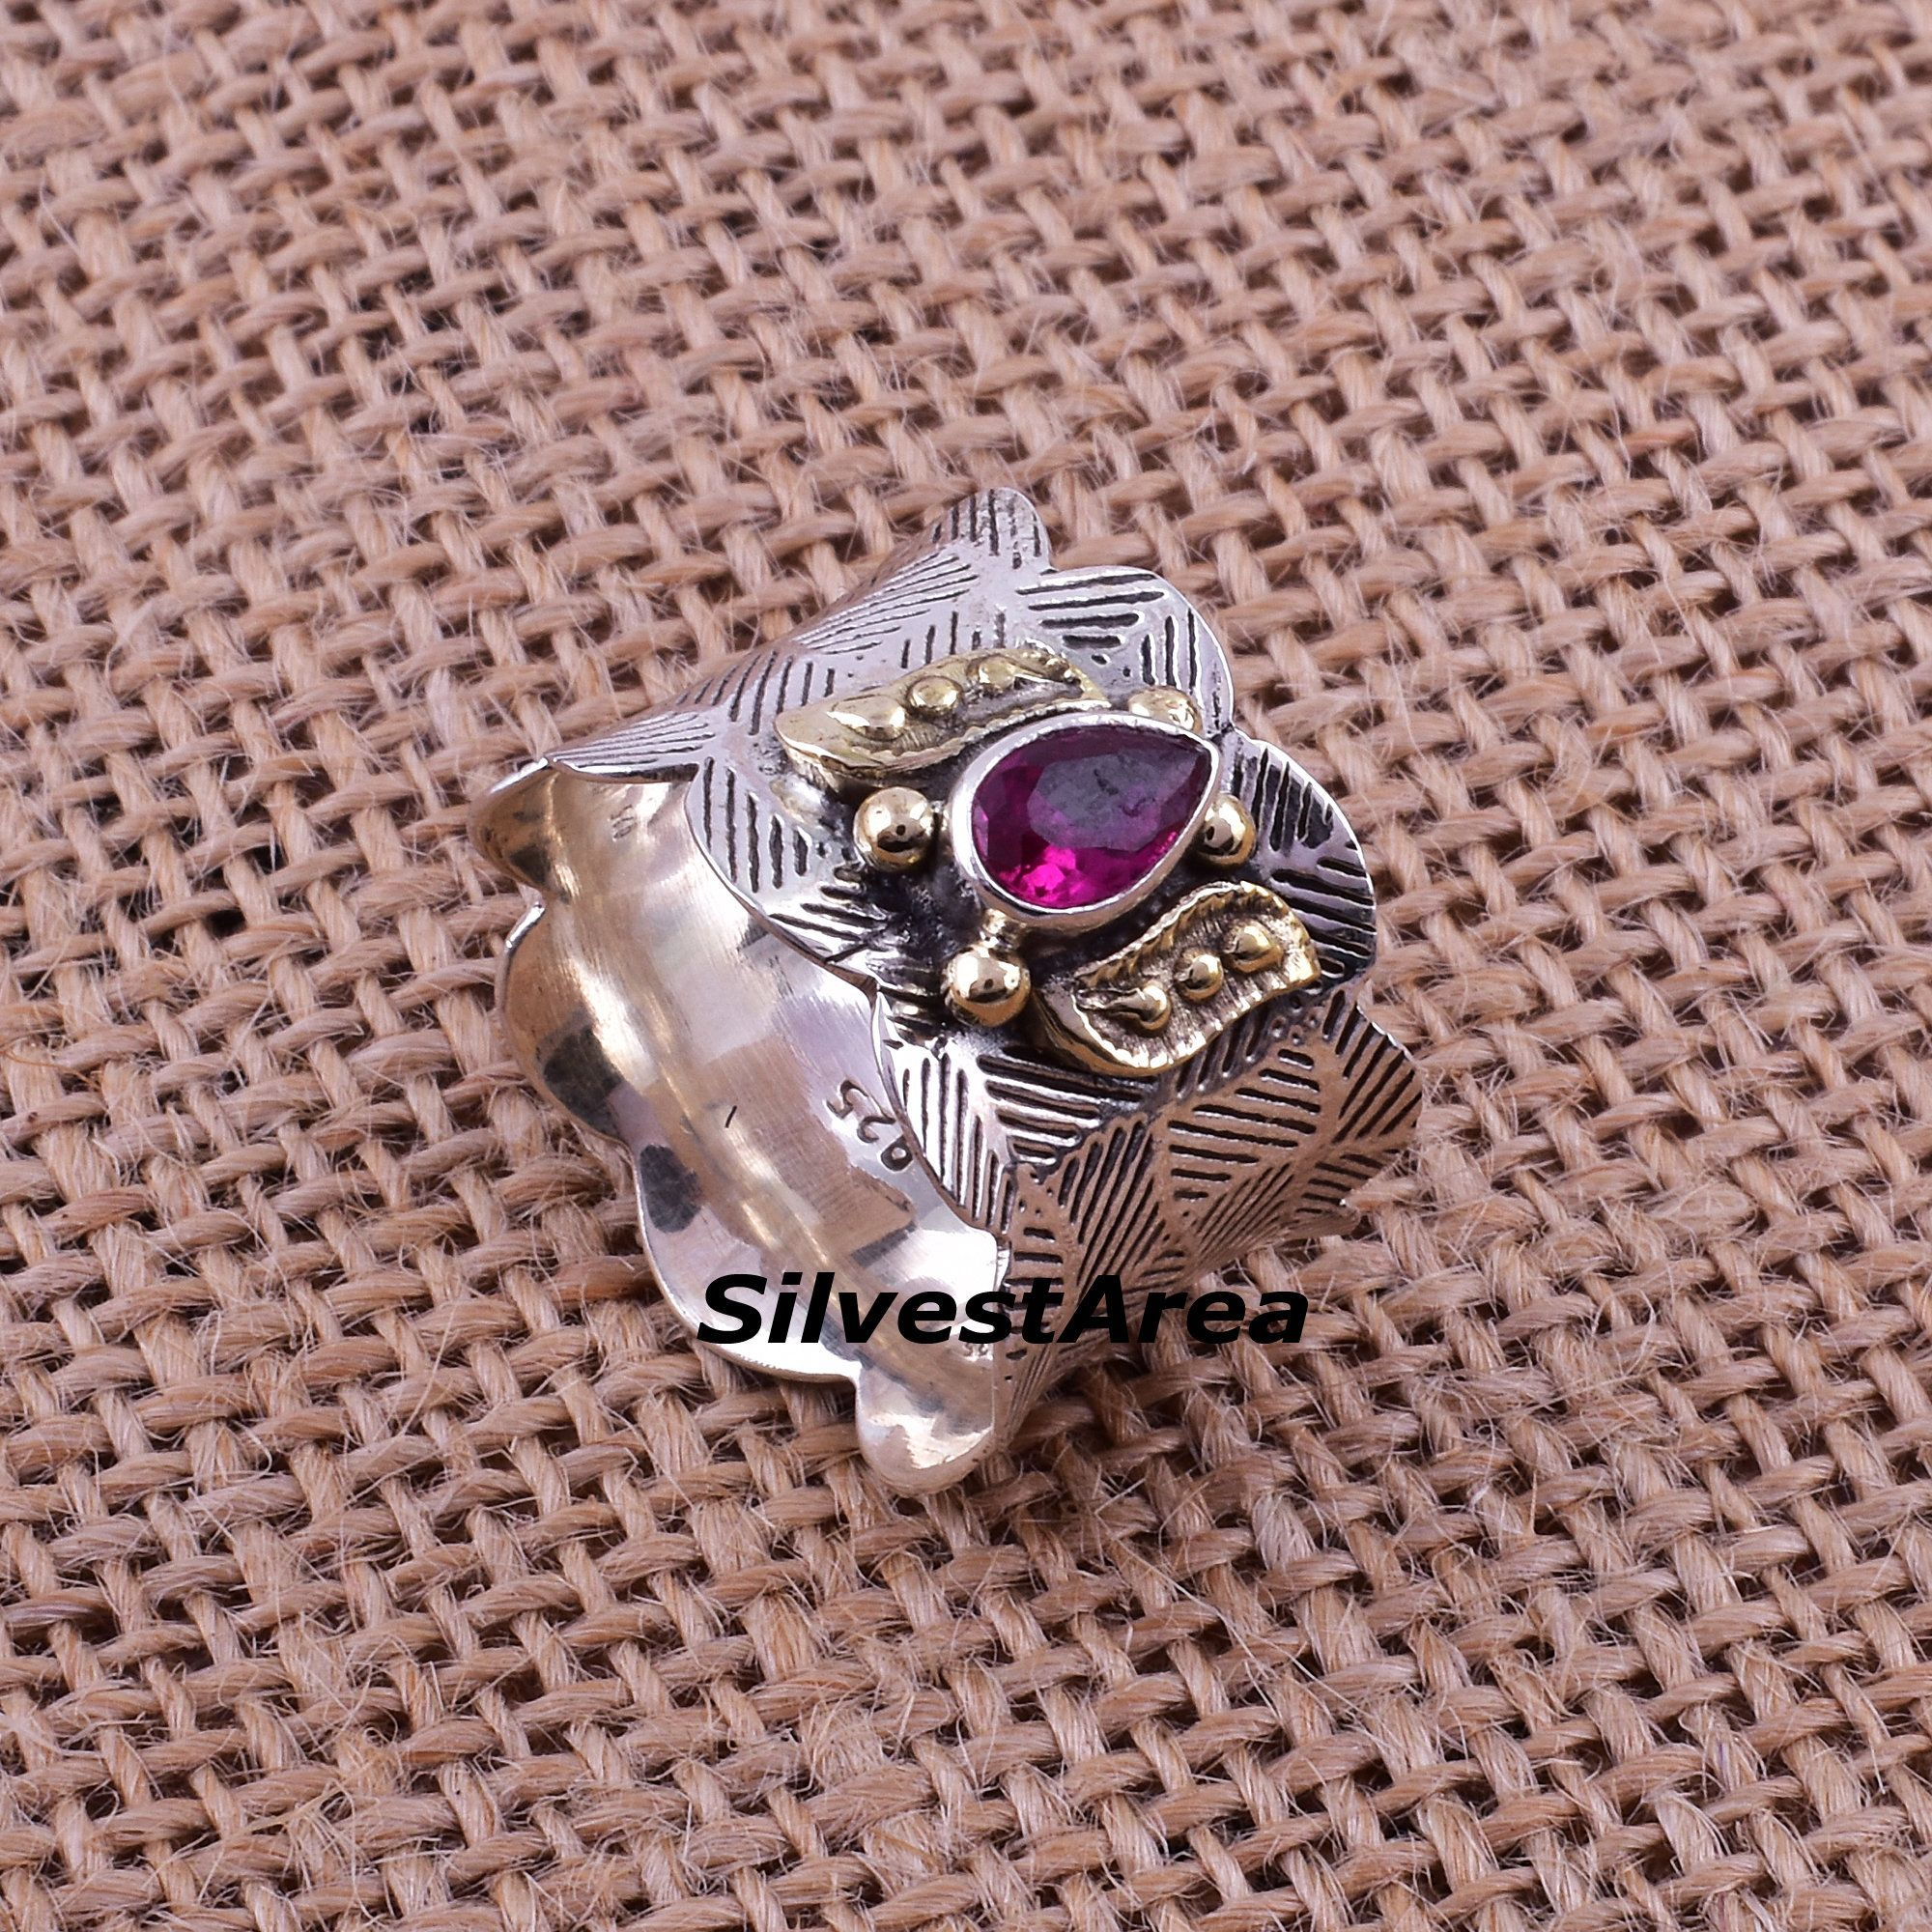 Photo of Garnet Statement Ring,Sterling Silver Ring,Anxiety Ring,Boho Ring,Dainty Ring,Handmade Jewelry,Gemstone Ring,January Birthstone,Unisex Band.